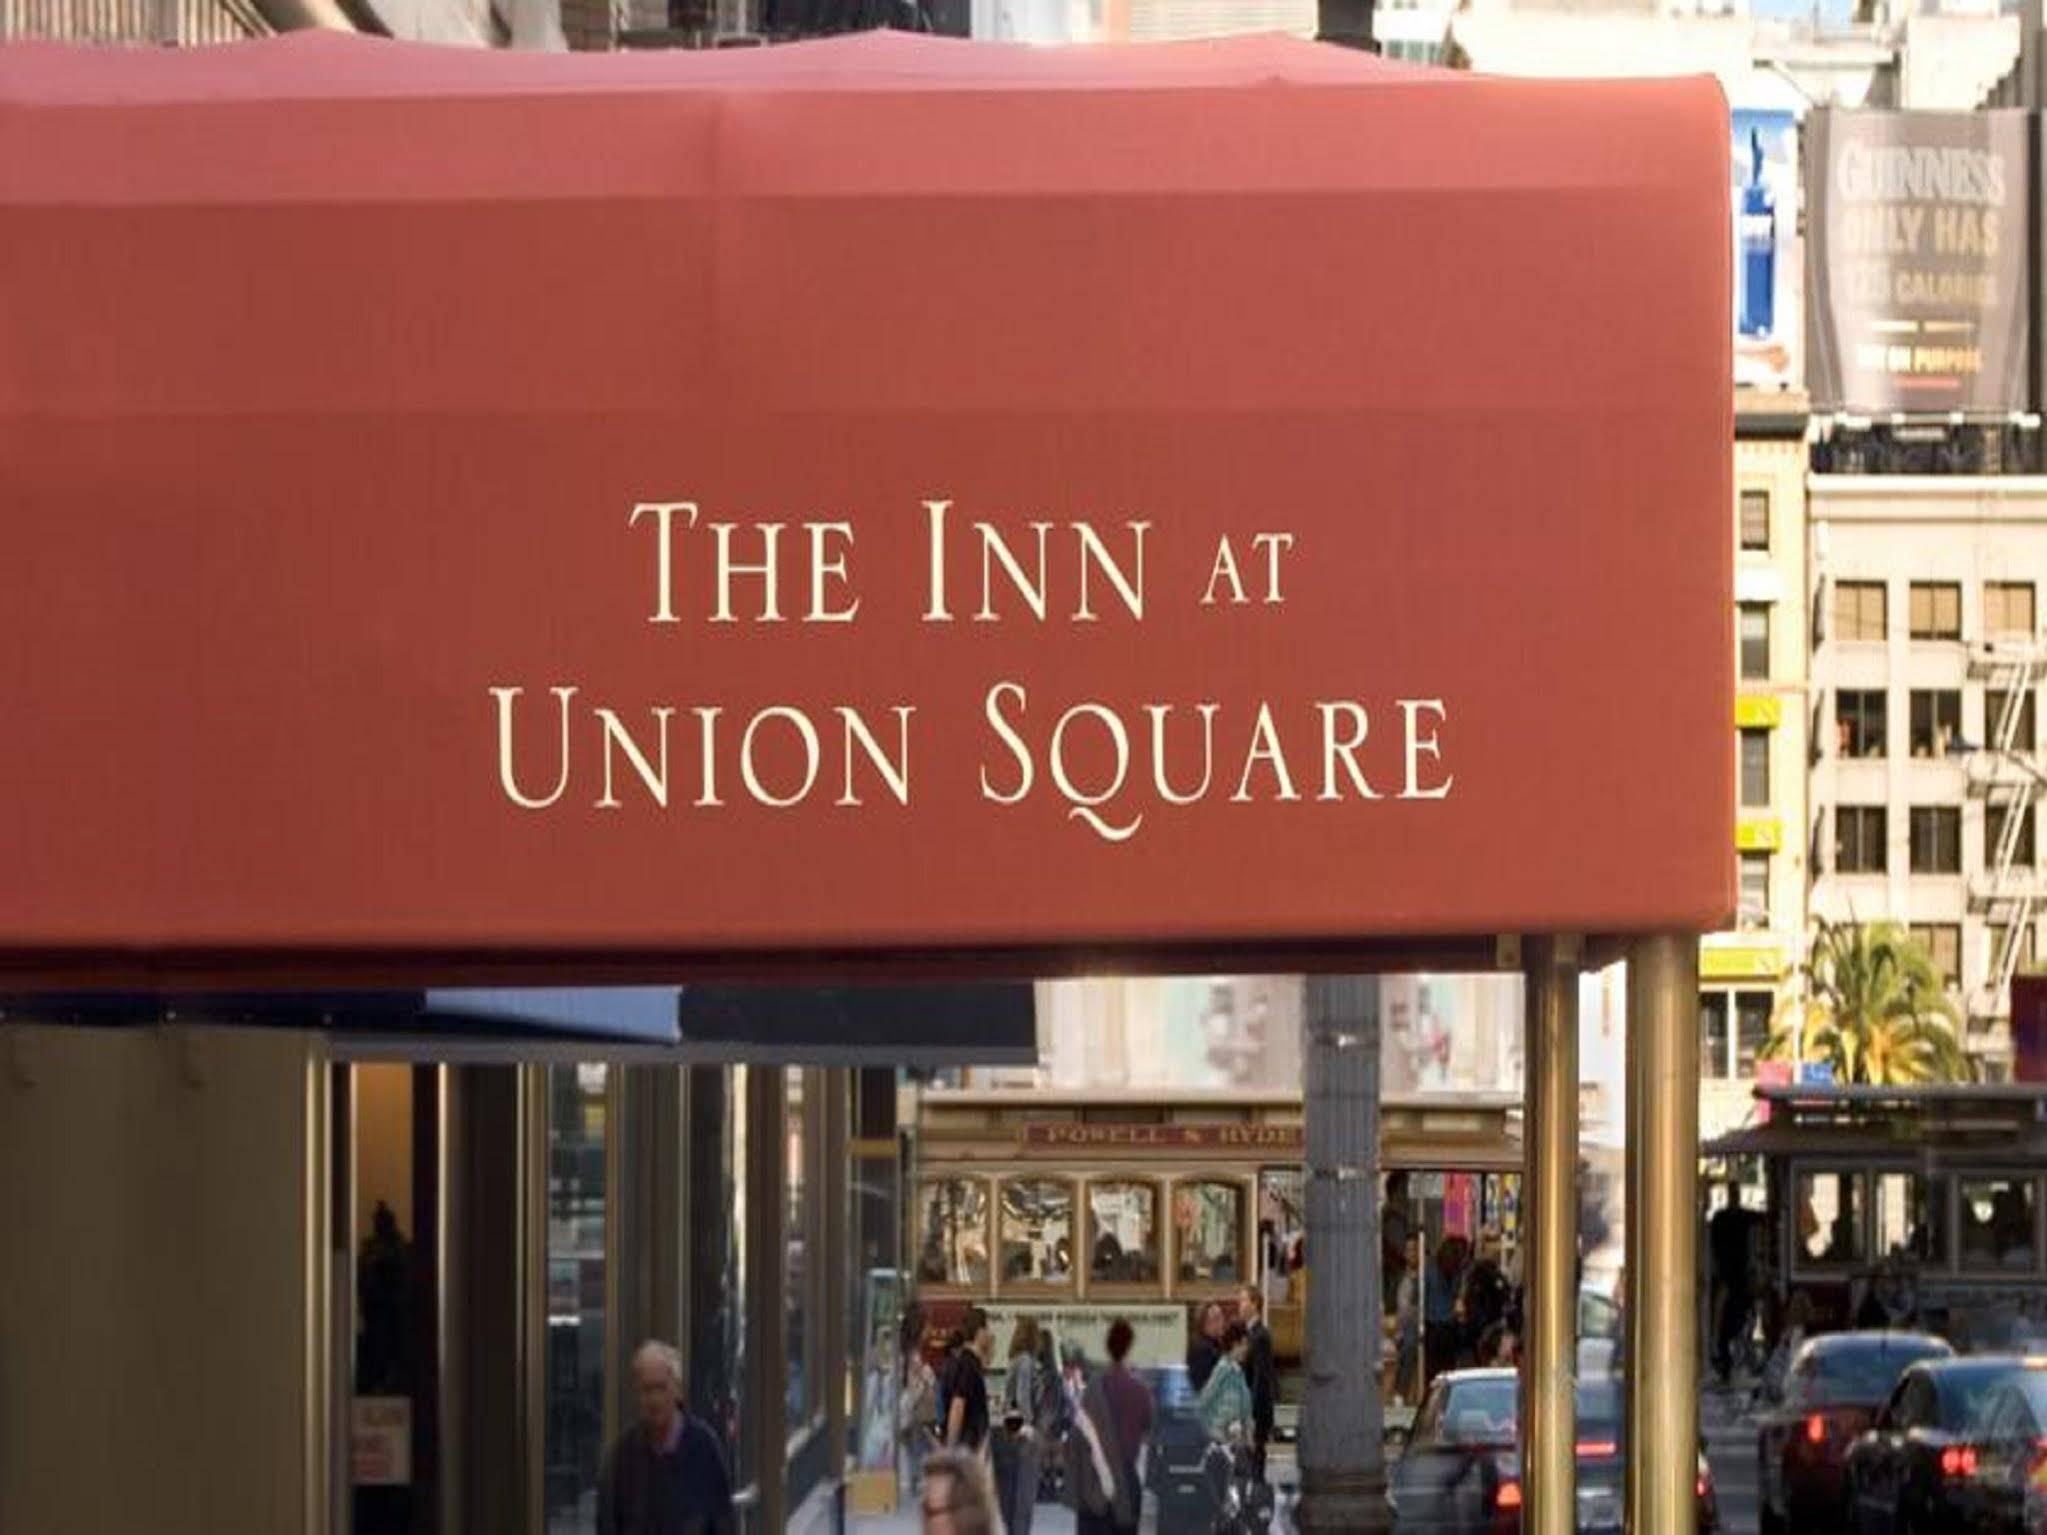 Inn at Union Square a Greystone Hotel